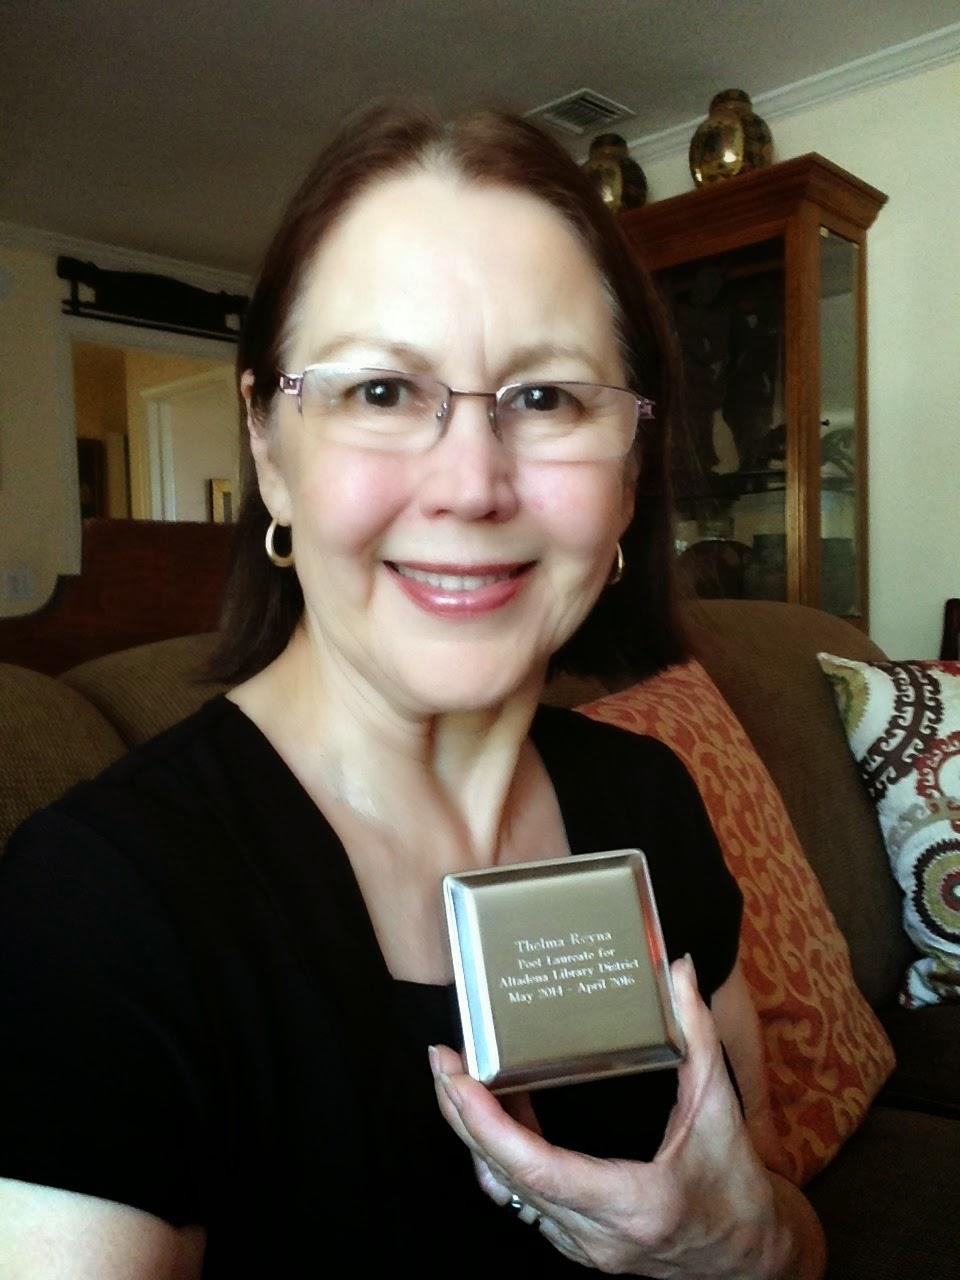 National Award-Winning Author, Thelma T. Reyna, Ph.D.